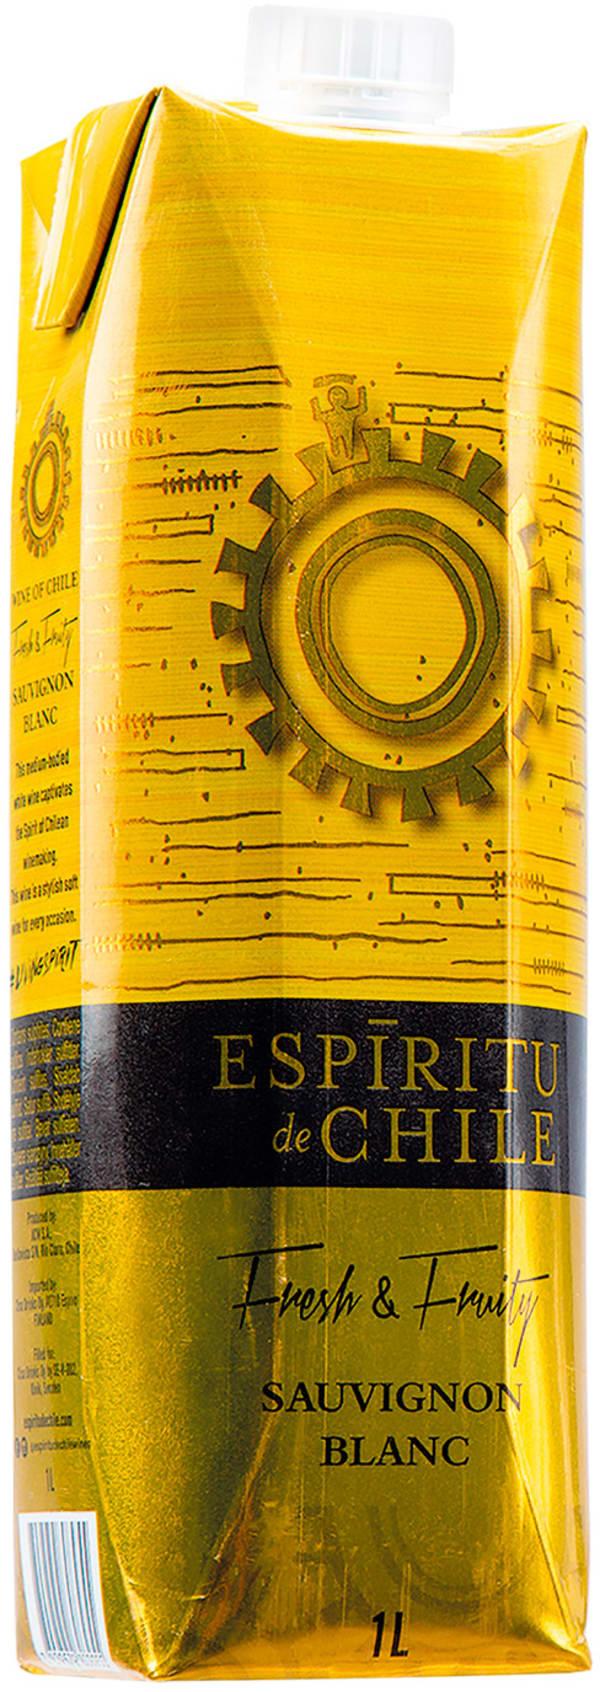 Espiritu de Chile Fresh & Fruity Sauvignon Blanc kartongförpackning